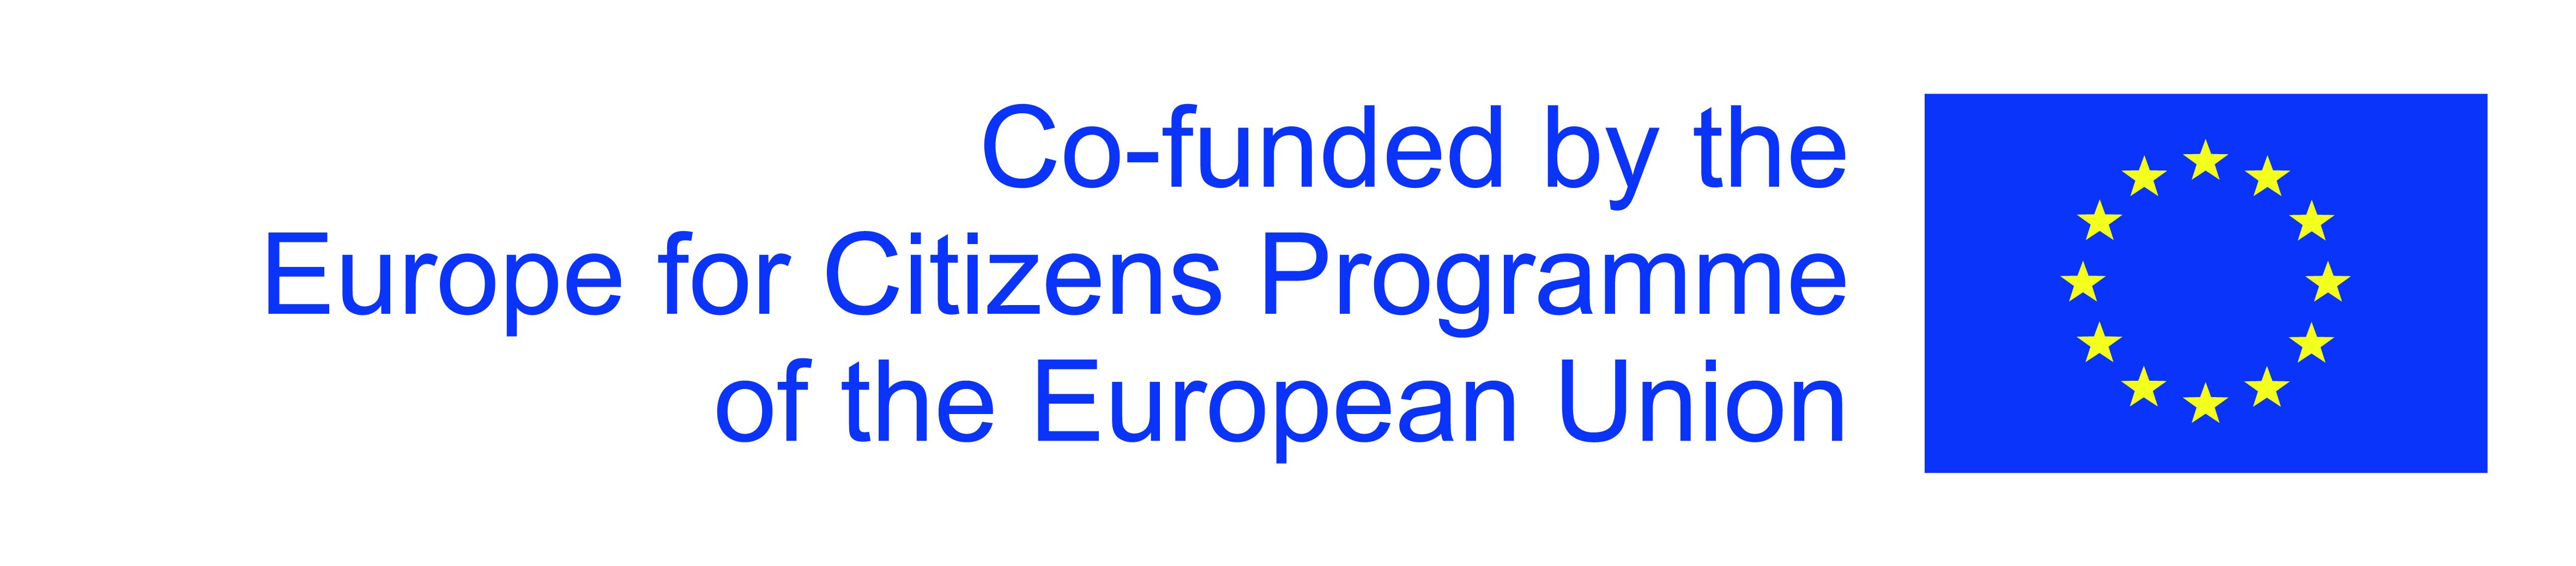 logosbeneficaireseuropeforcitizensleft